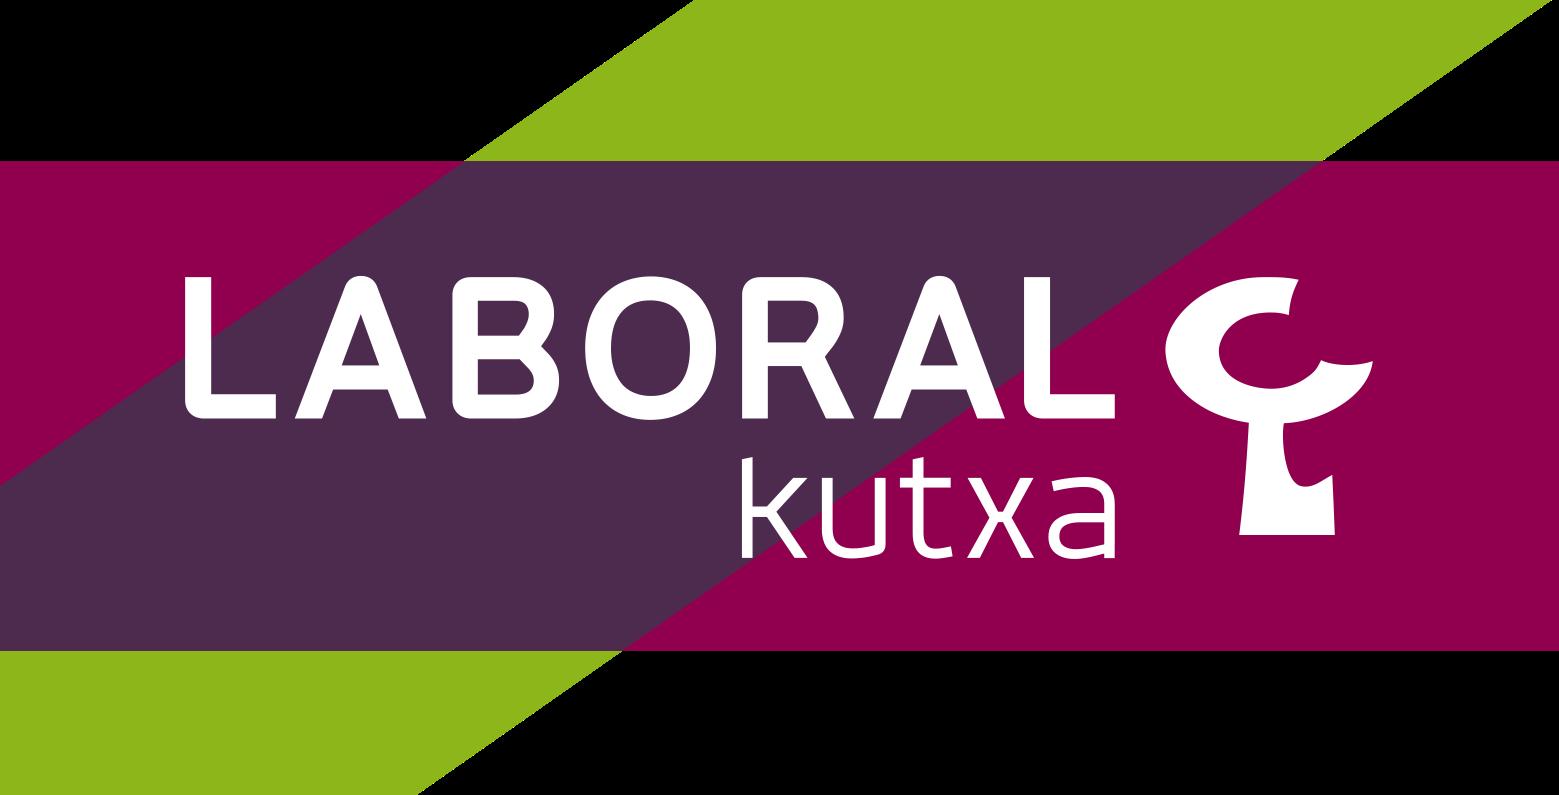 LABORAL KUTXA - COLABORADOR EUSKO BIKE